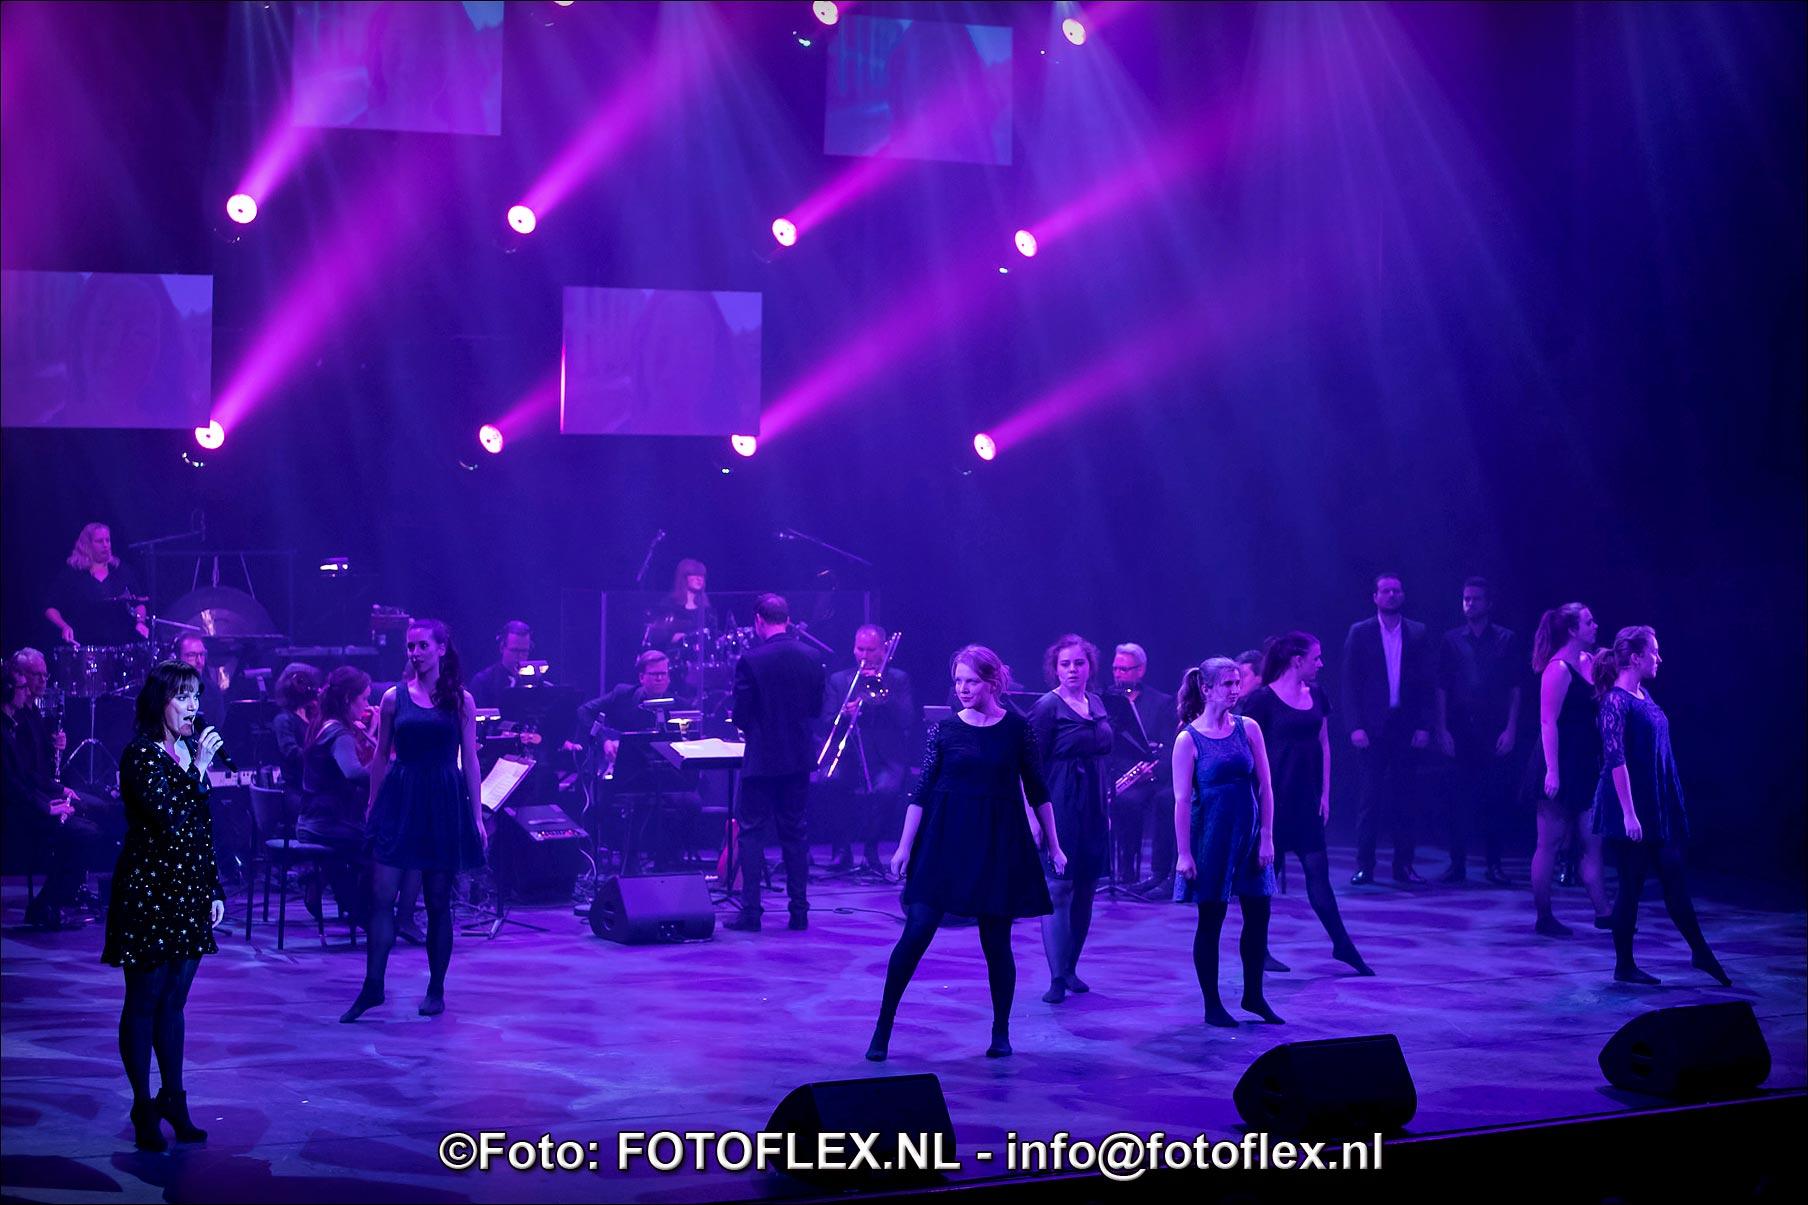 0640-CopyrightFOTOFLEX.NL07012020